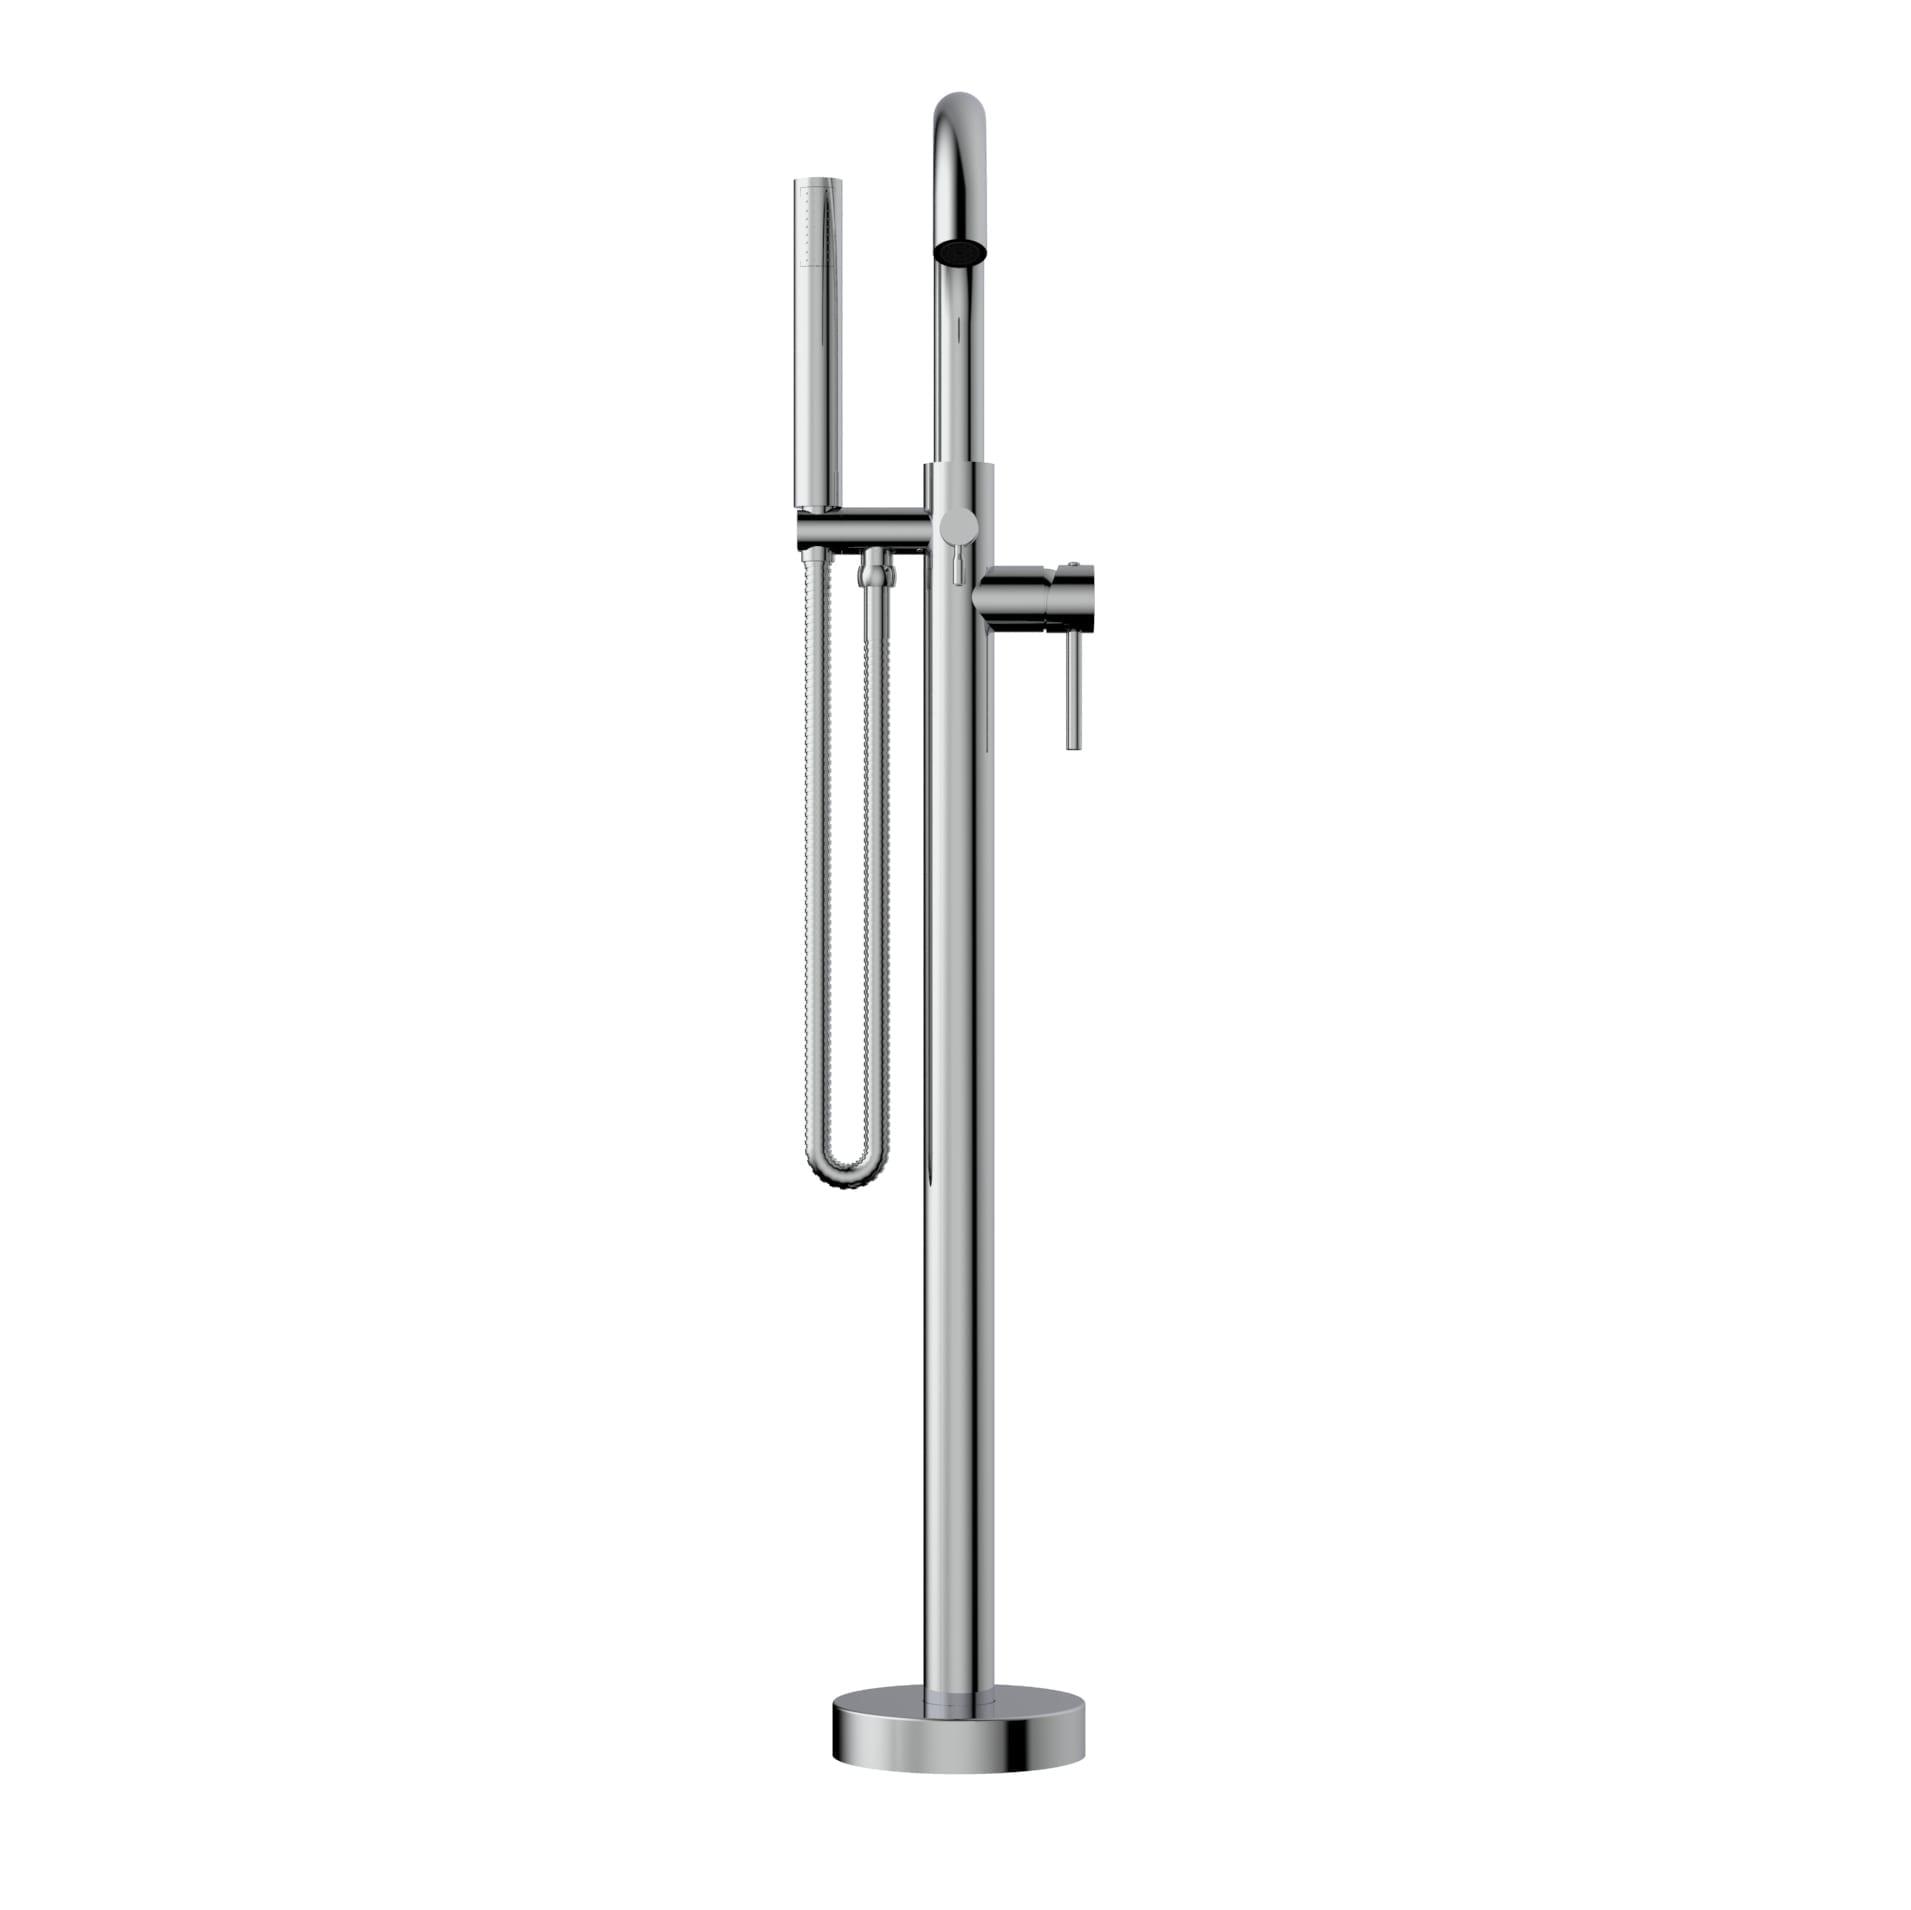 Bathtub Faucet - Complete model // Floor Mount Bathtub Filler, Hand ...